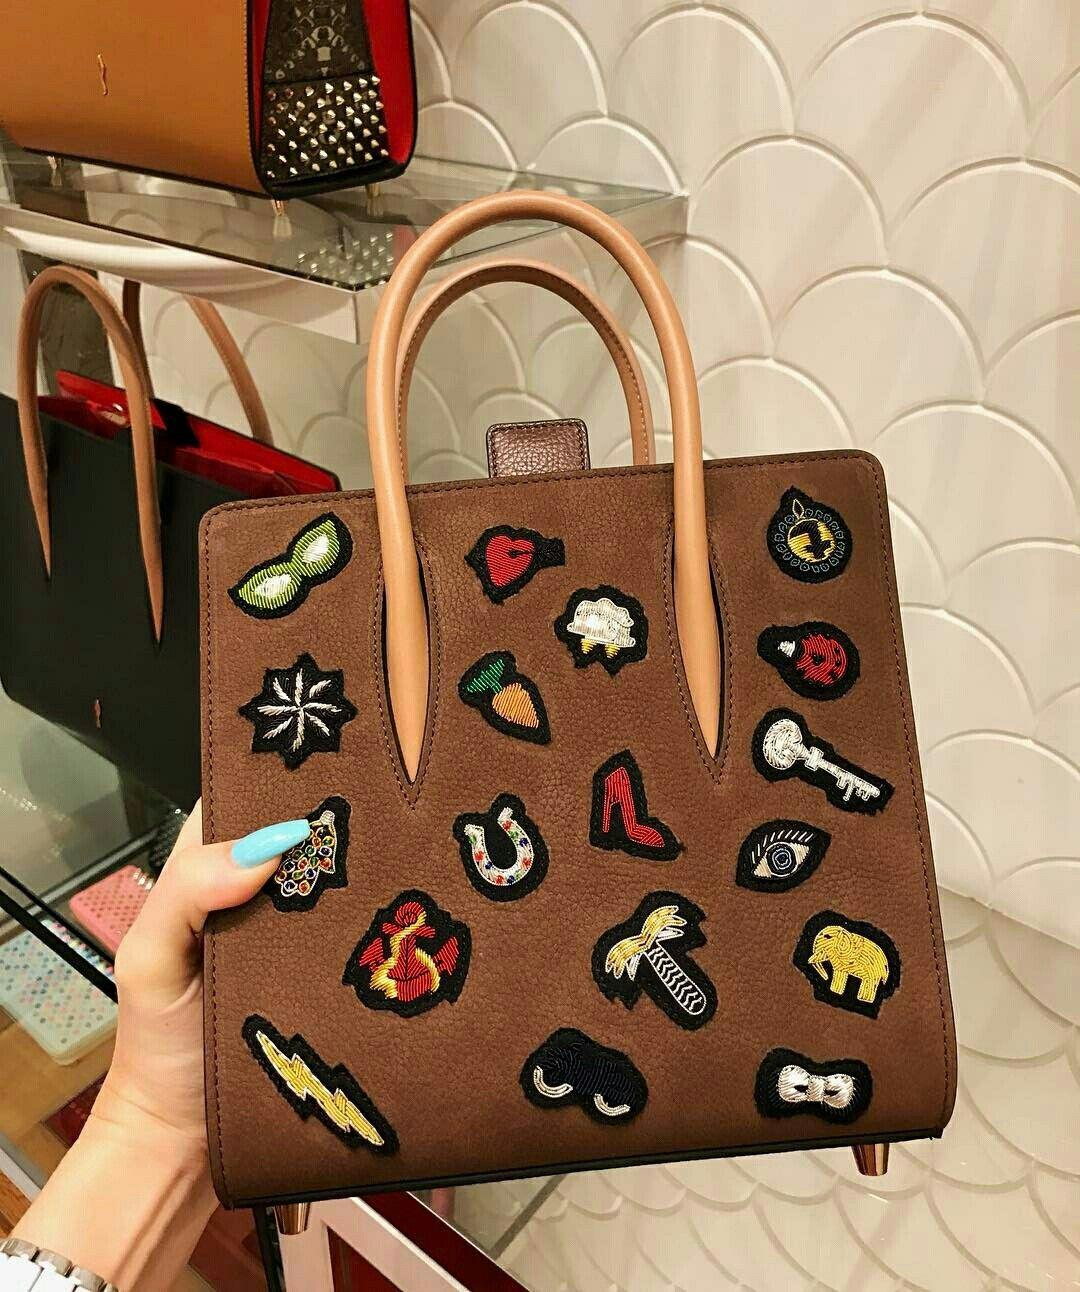 мorejнayetotнeworld Louboutin bags, Bags, Louis vuitton